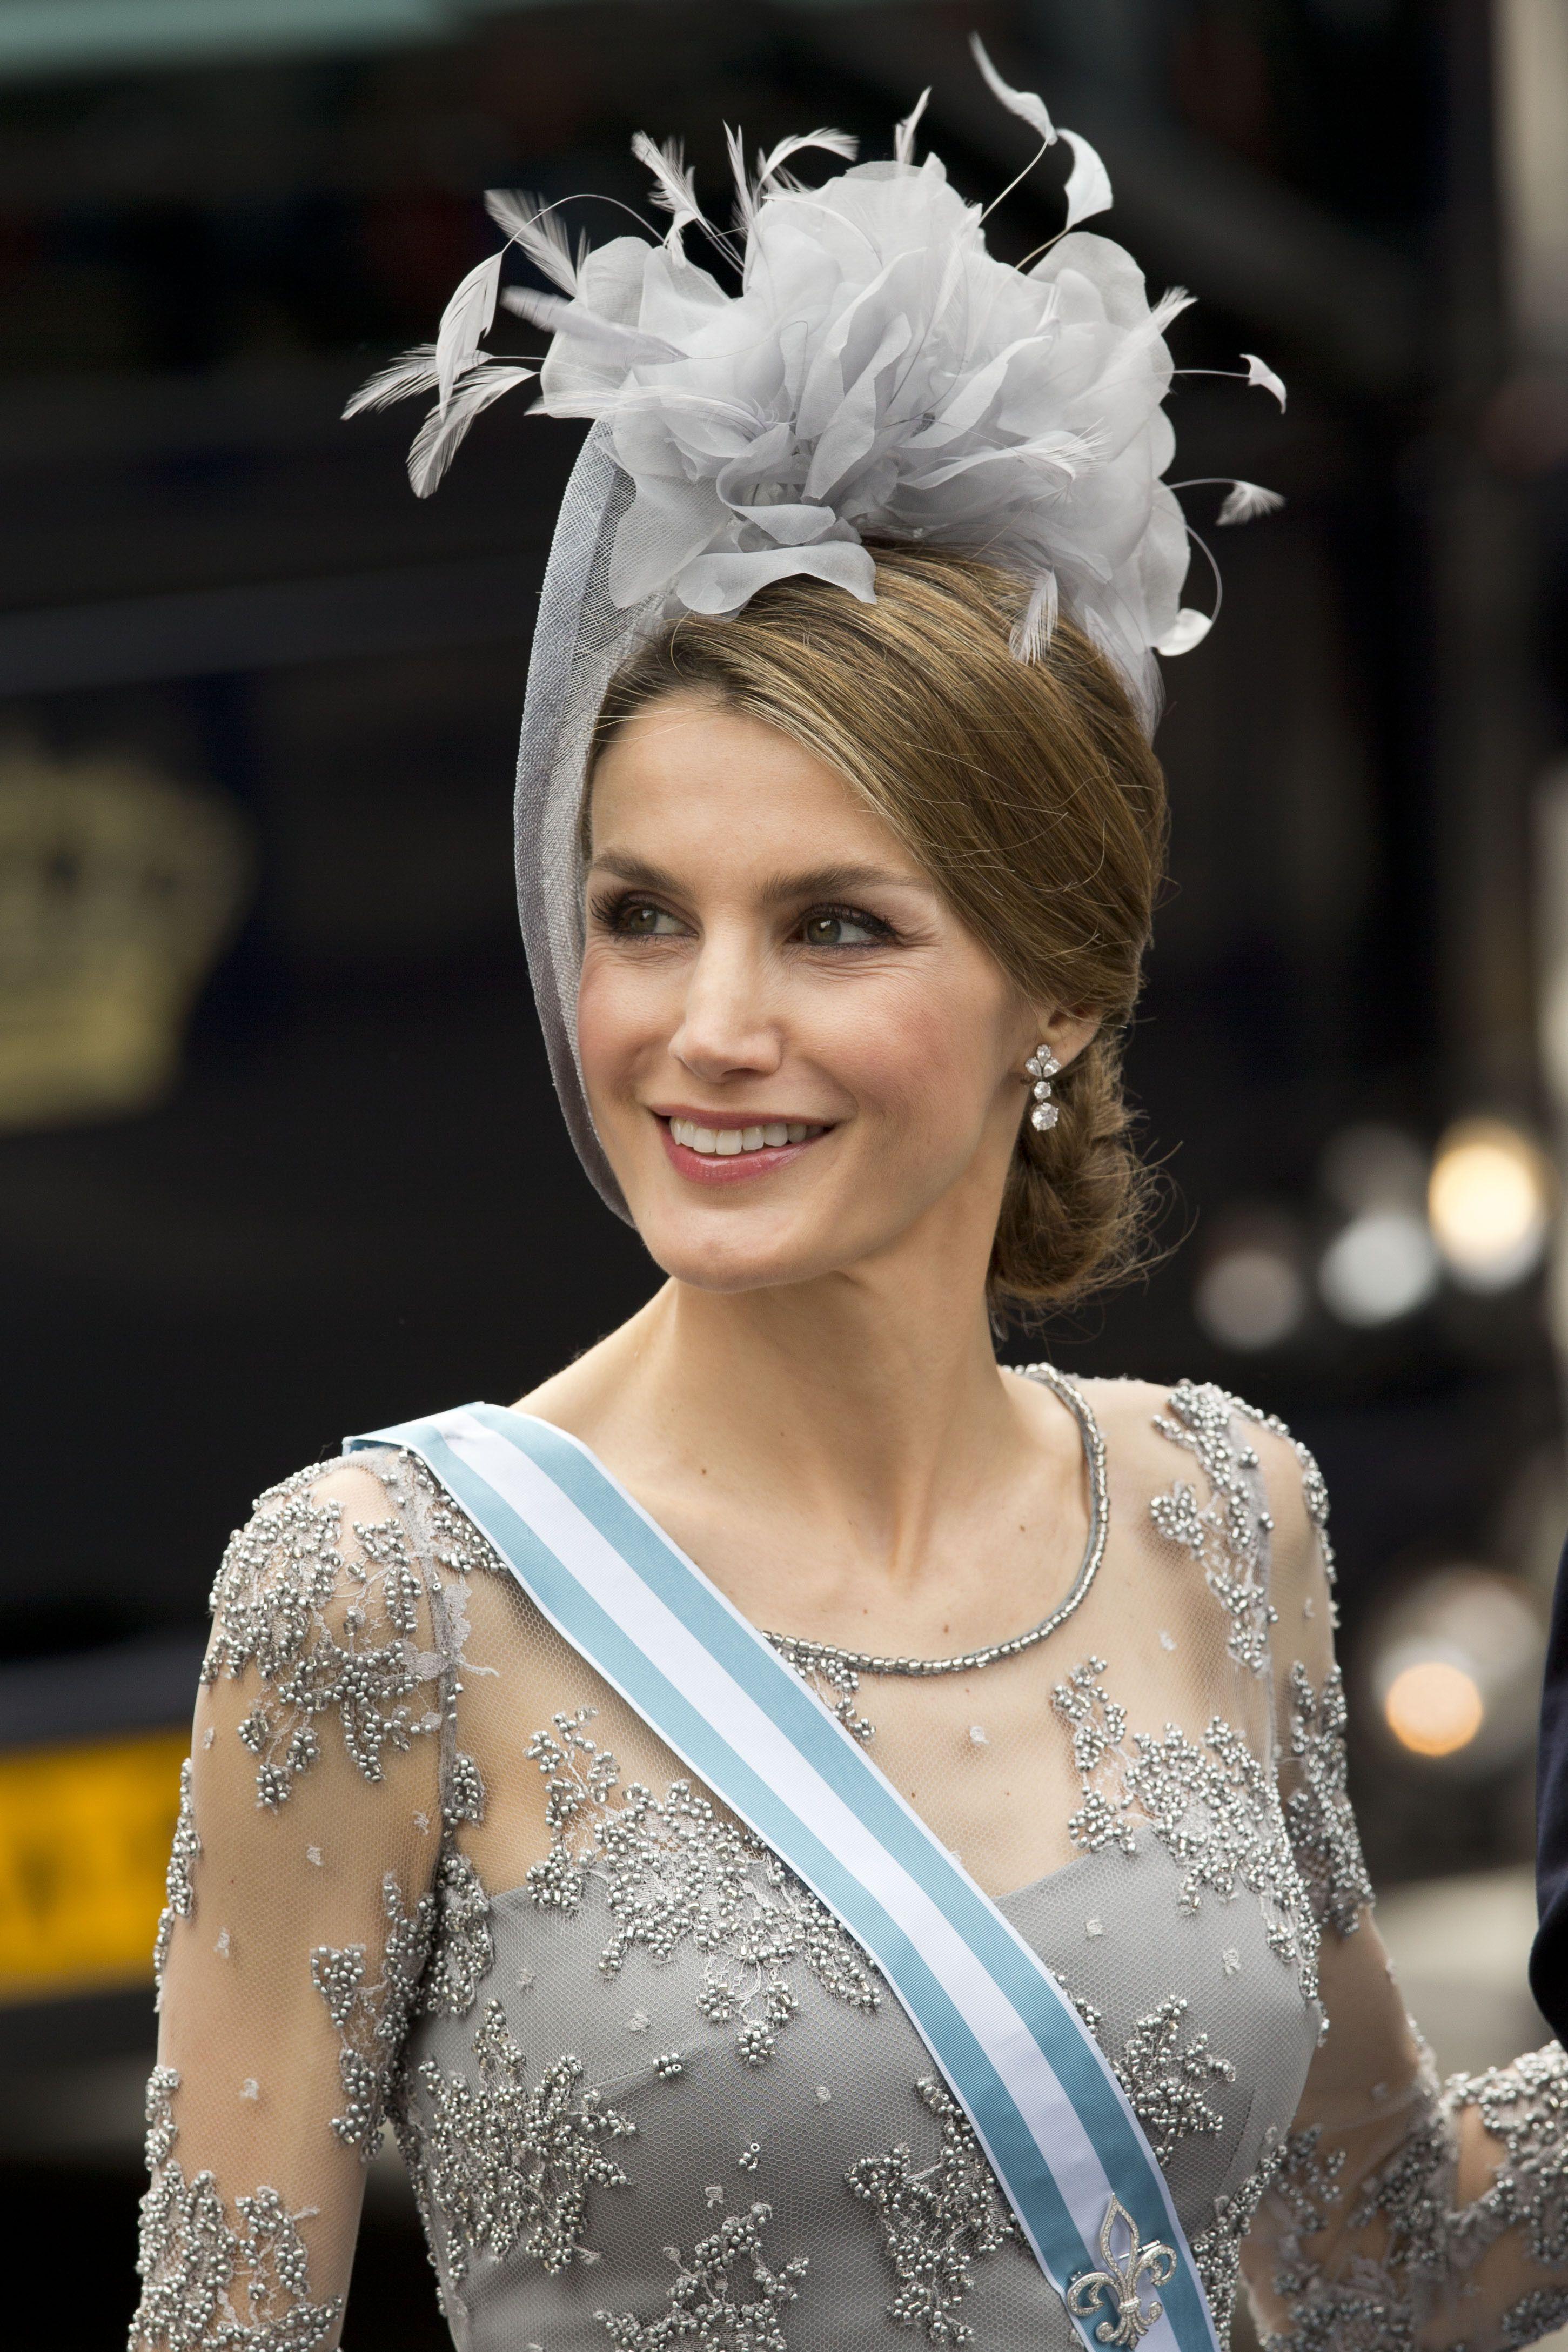 Coronación en Holanda. Princesa Letizia